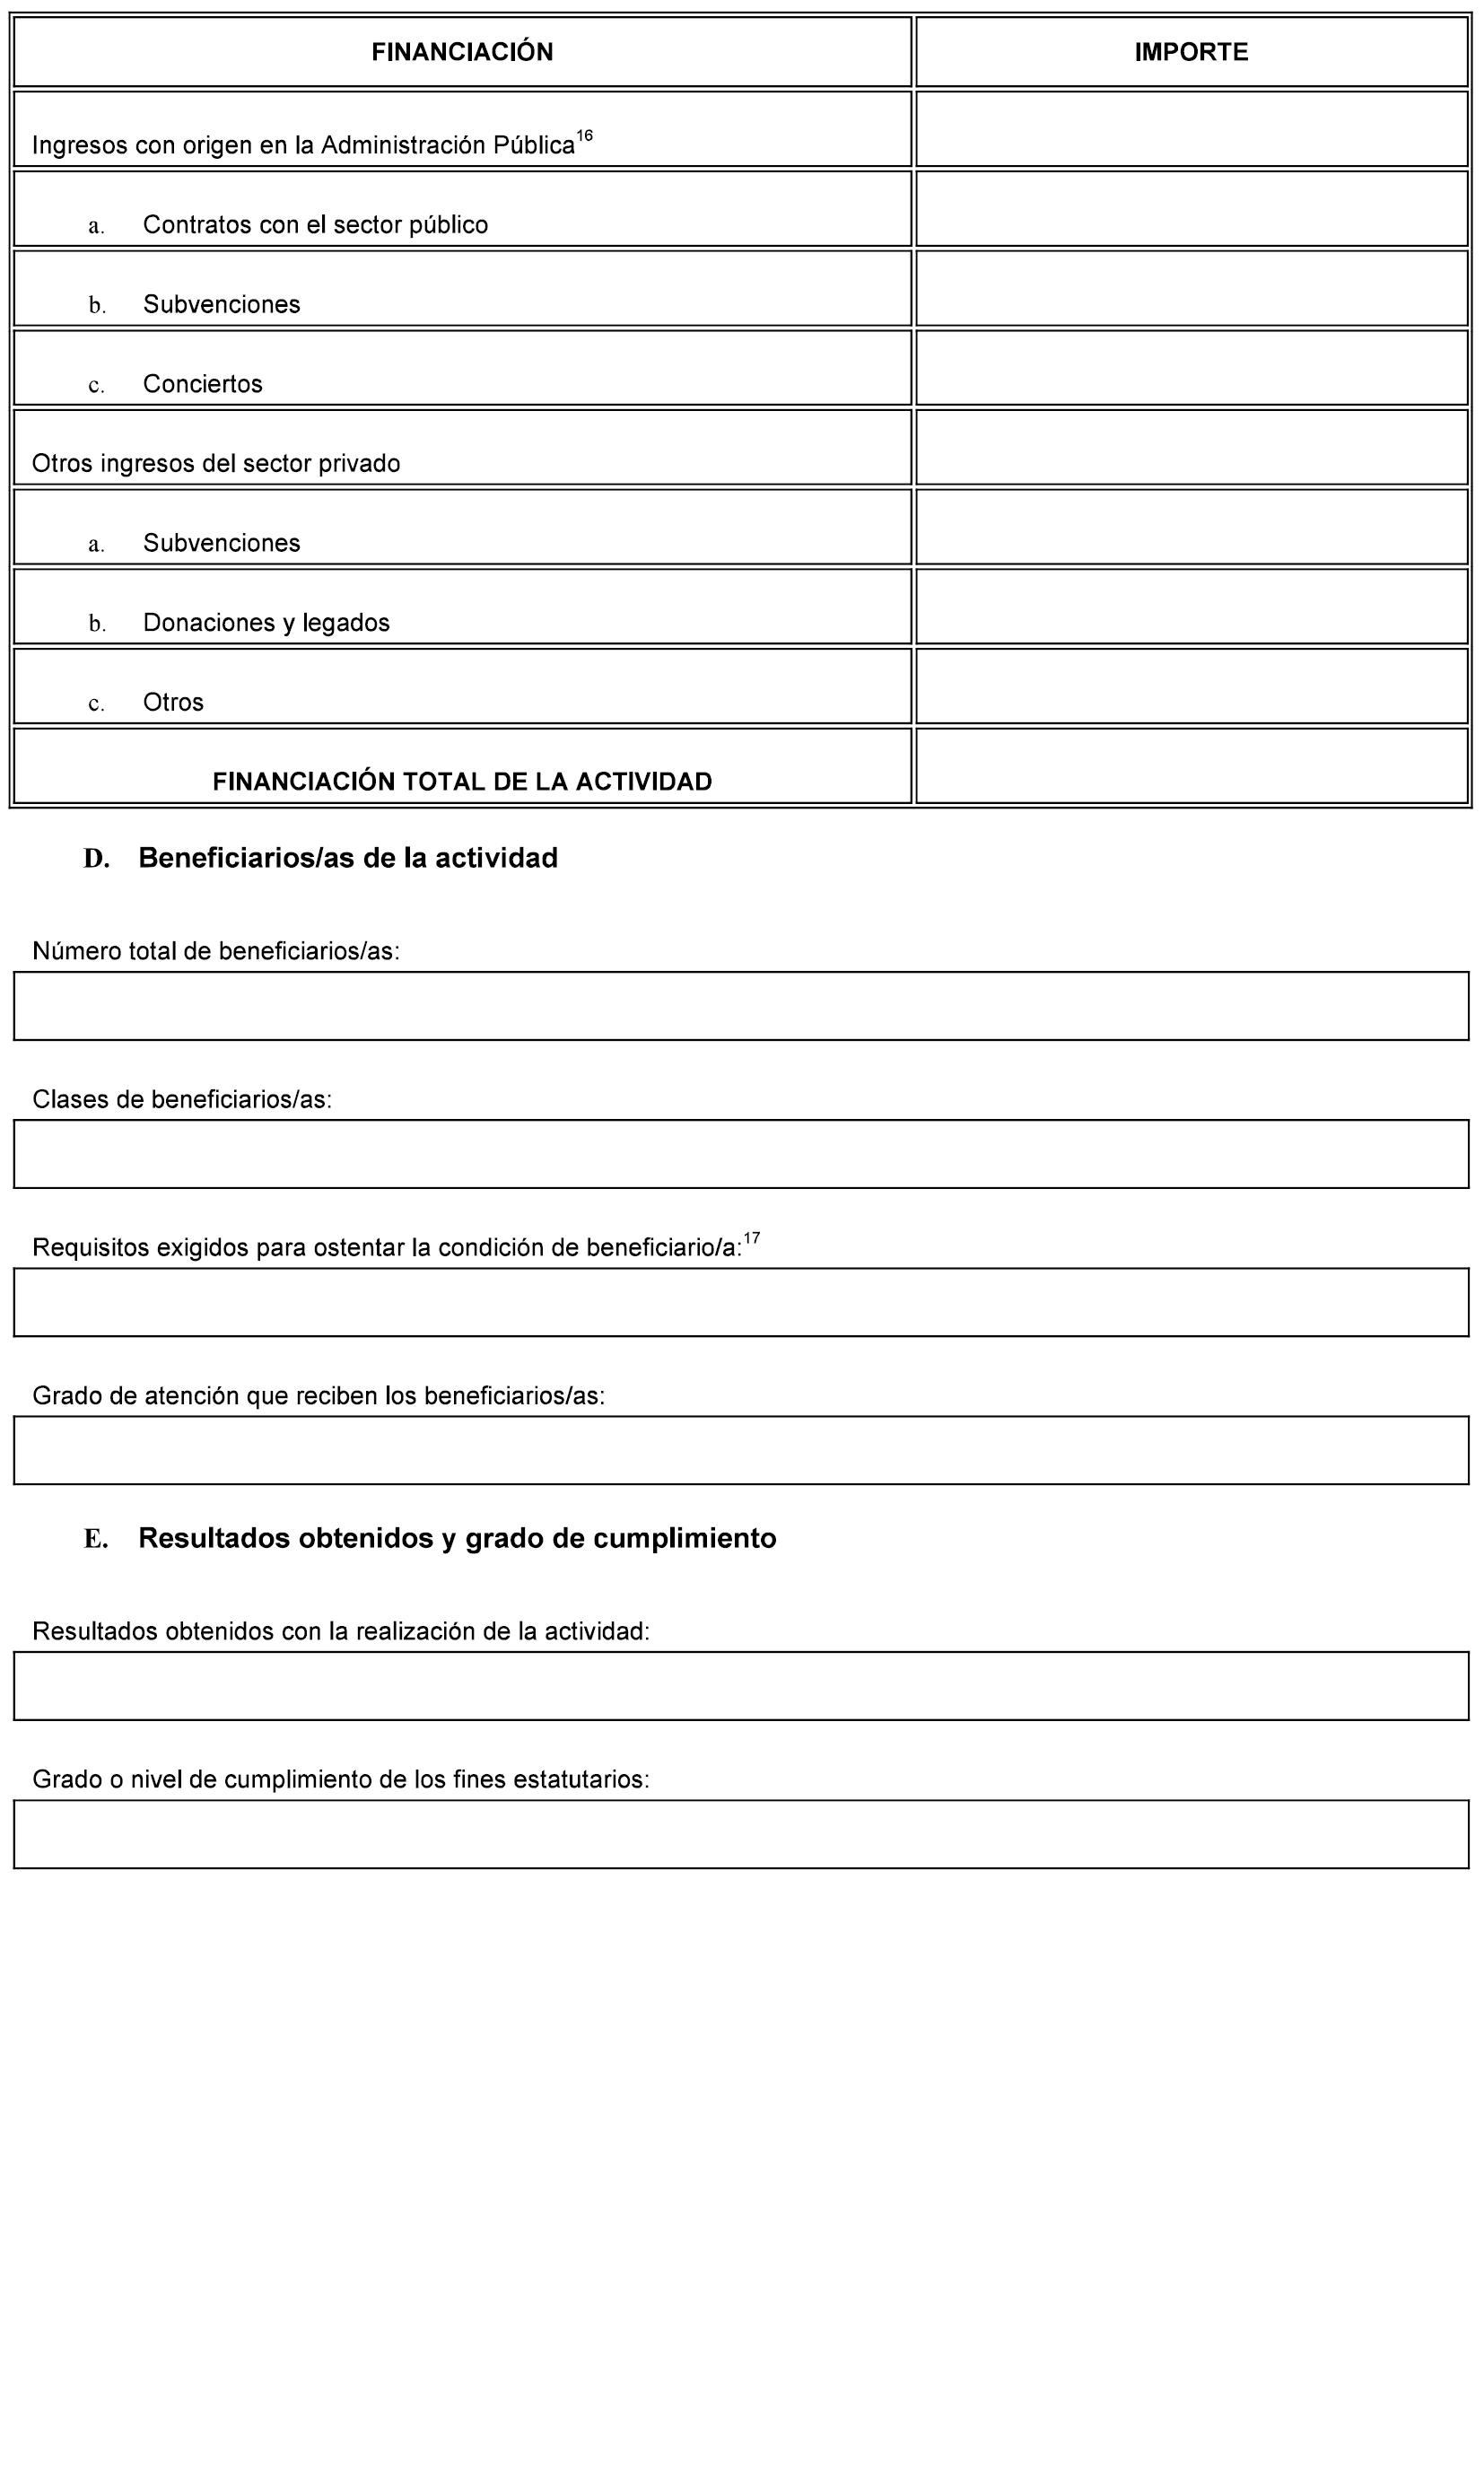 BOE.es - Documento BOE-A-2014-6728